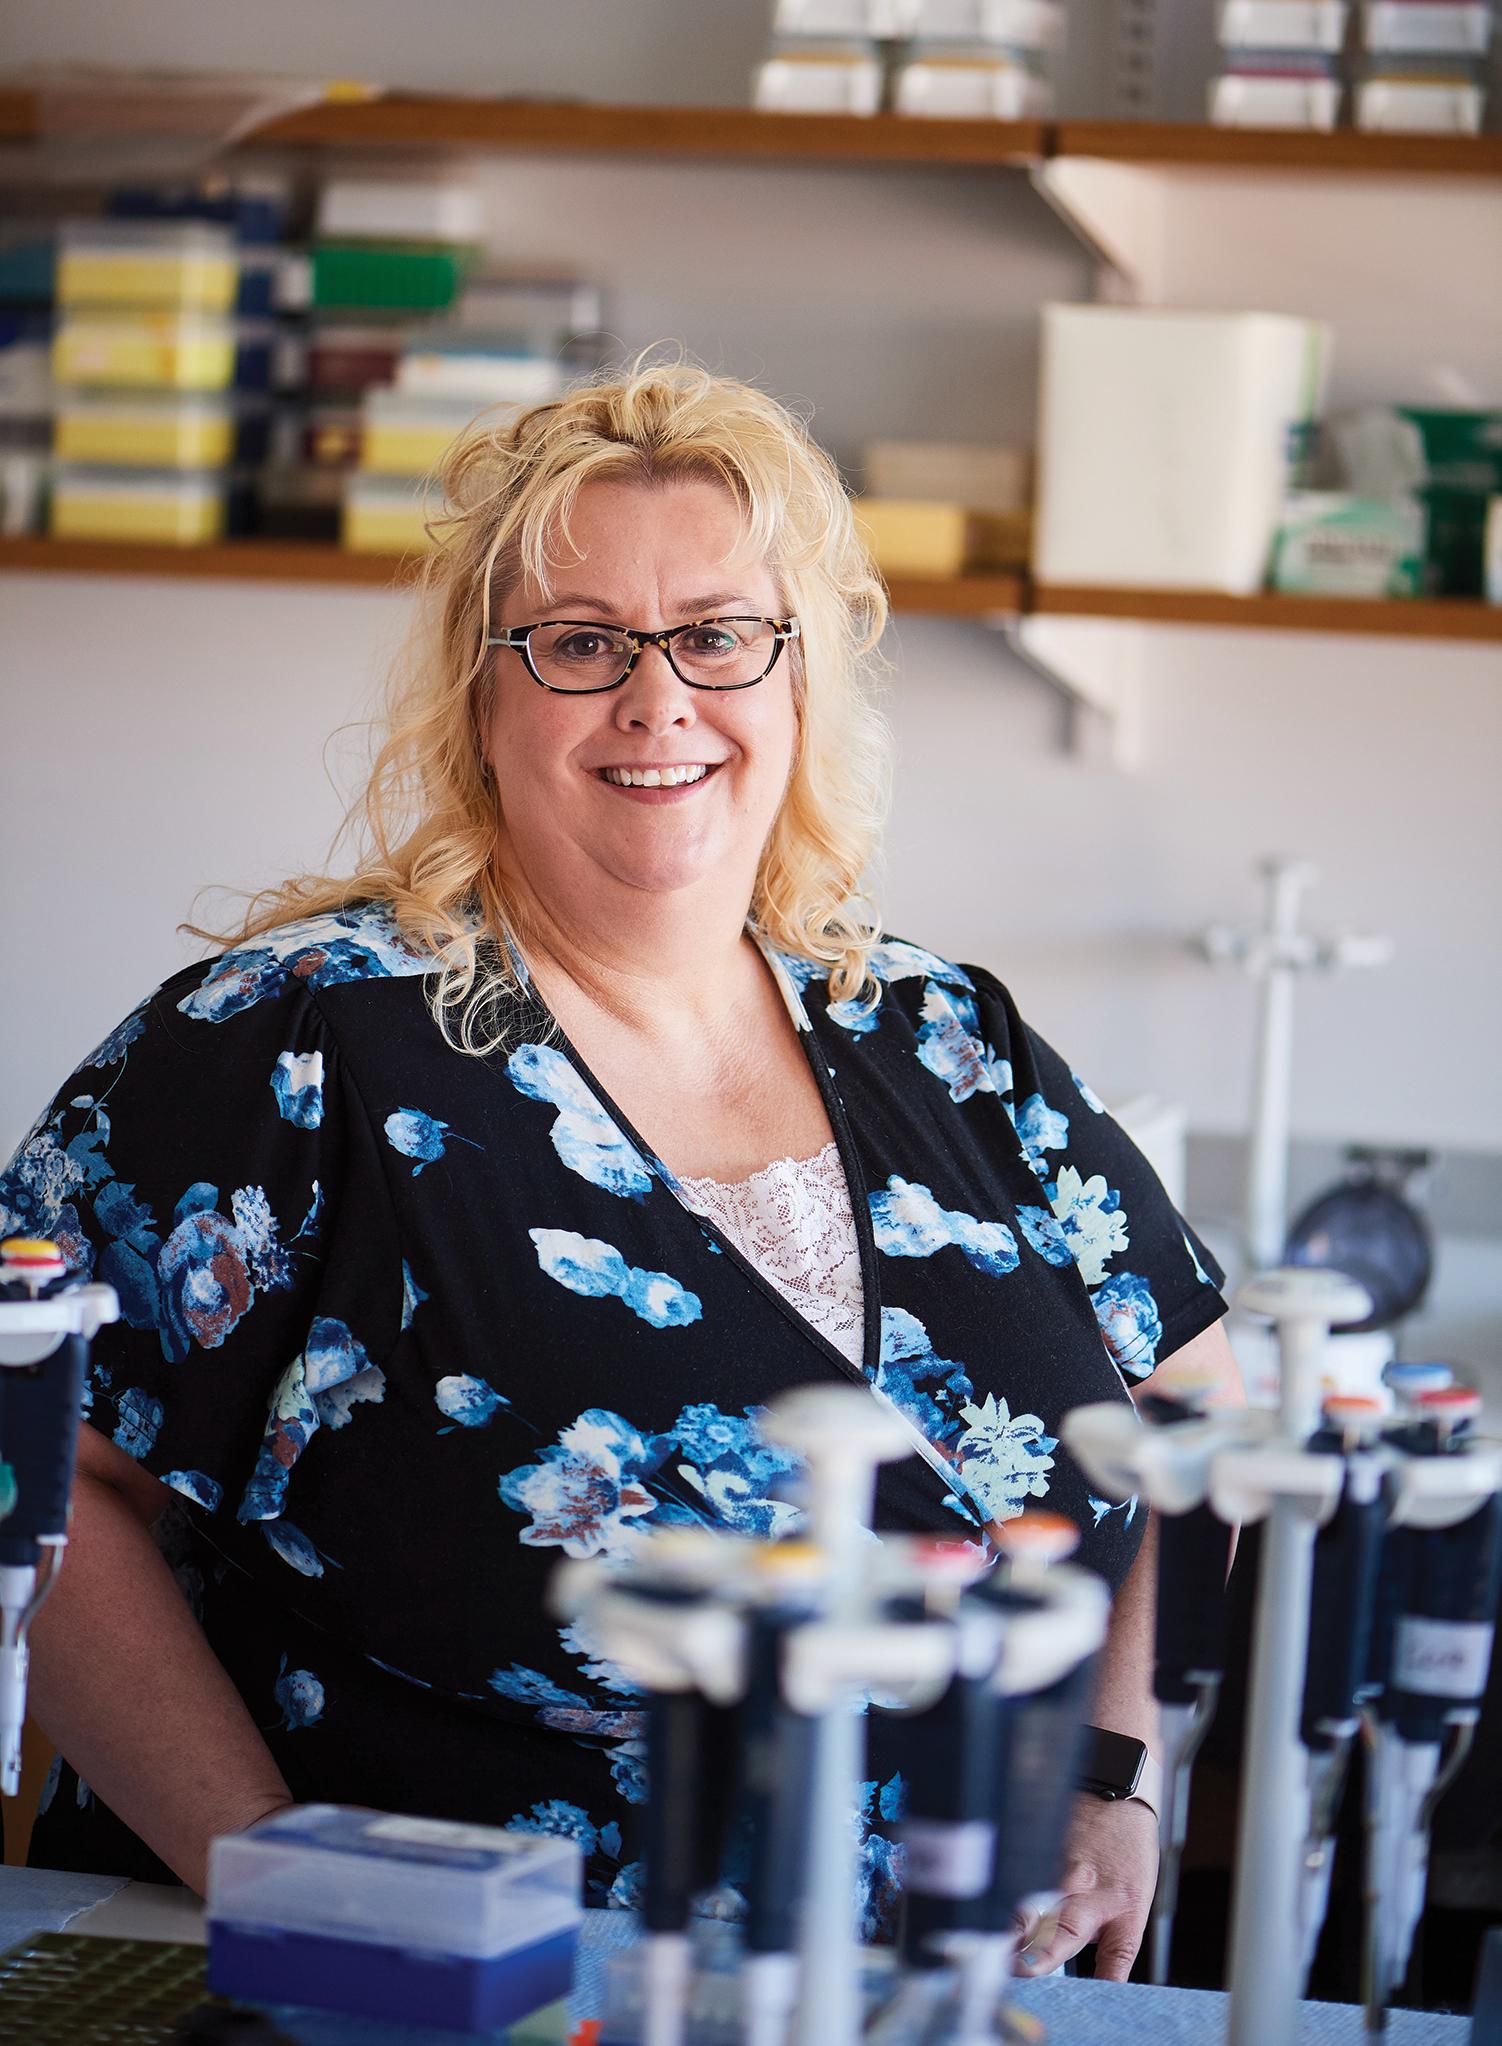 Judy Brown '98 MS, '07 Ph.D.